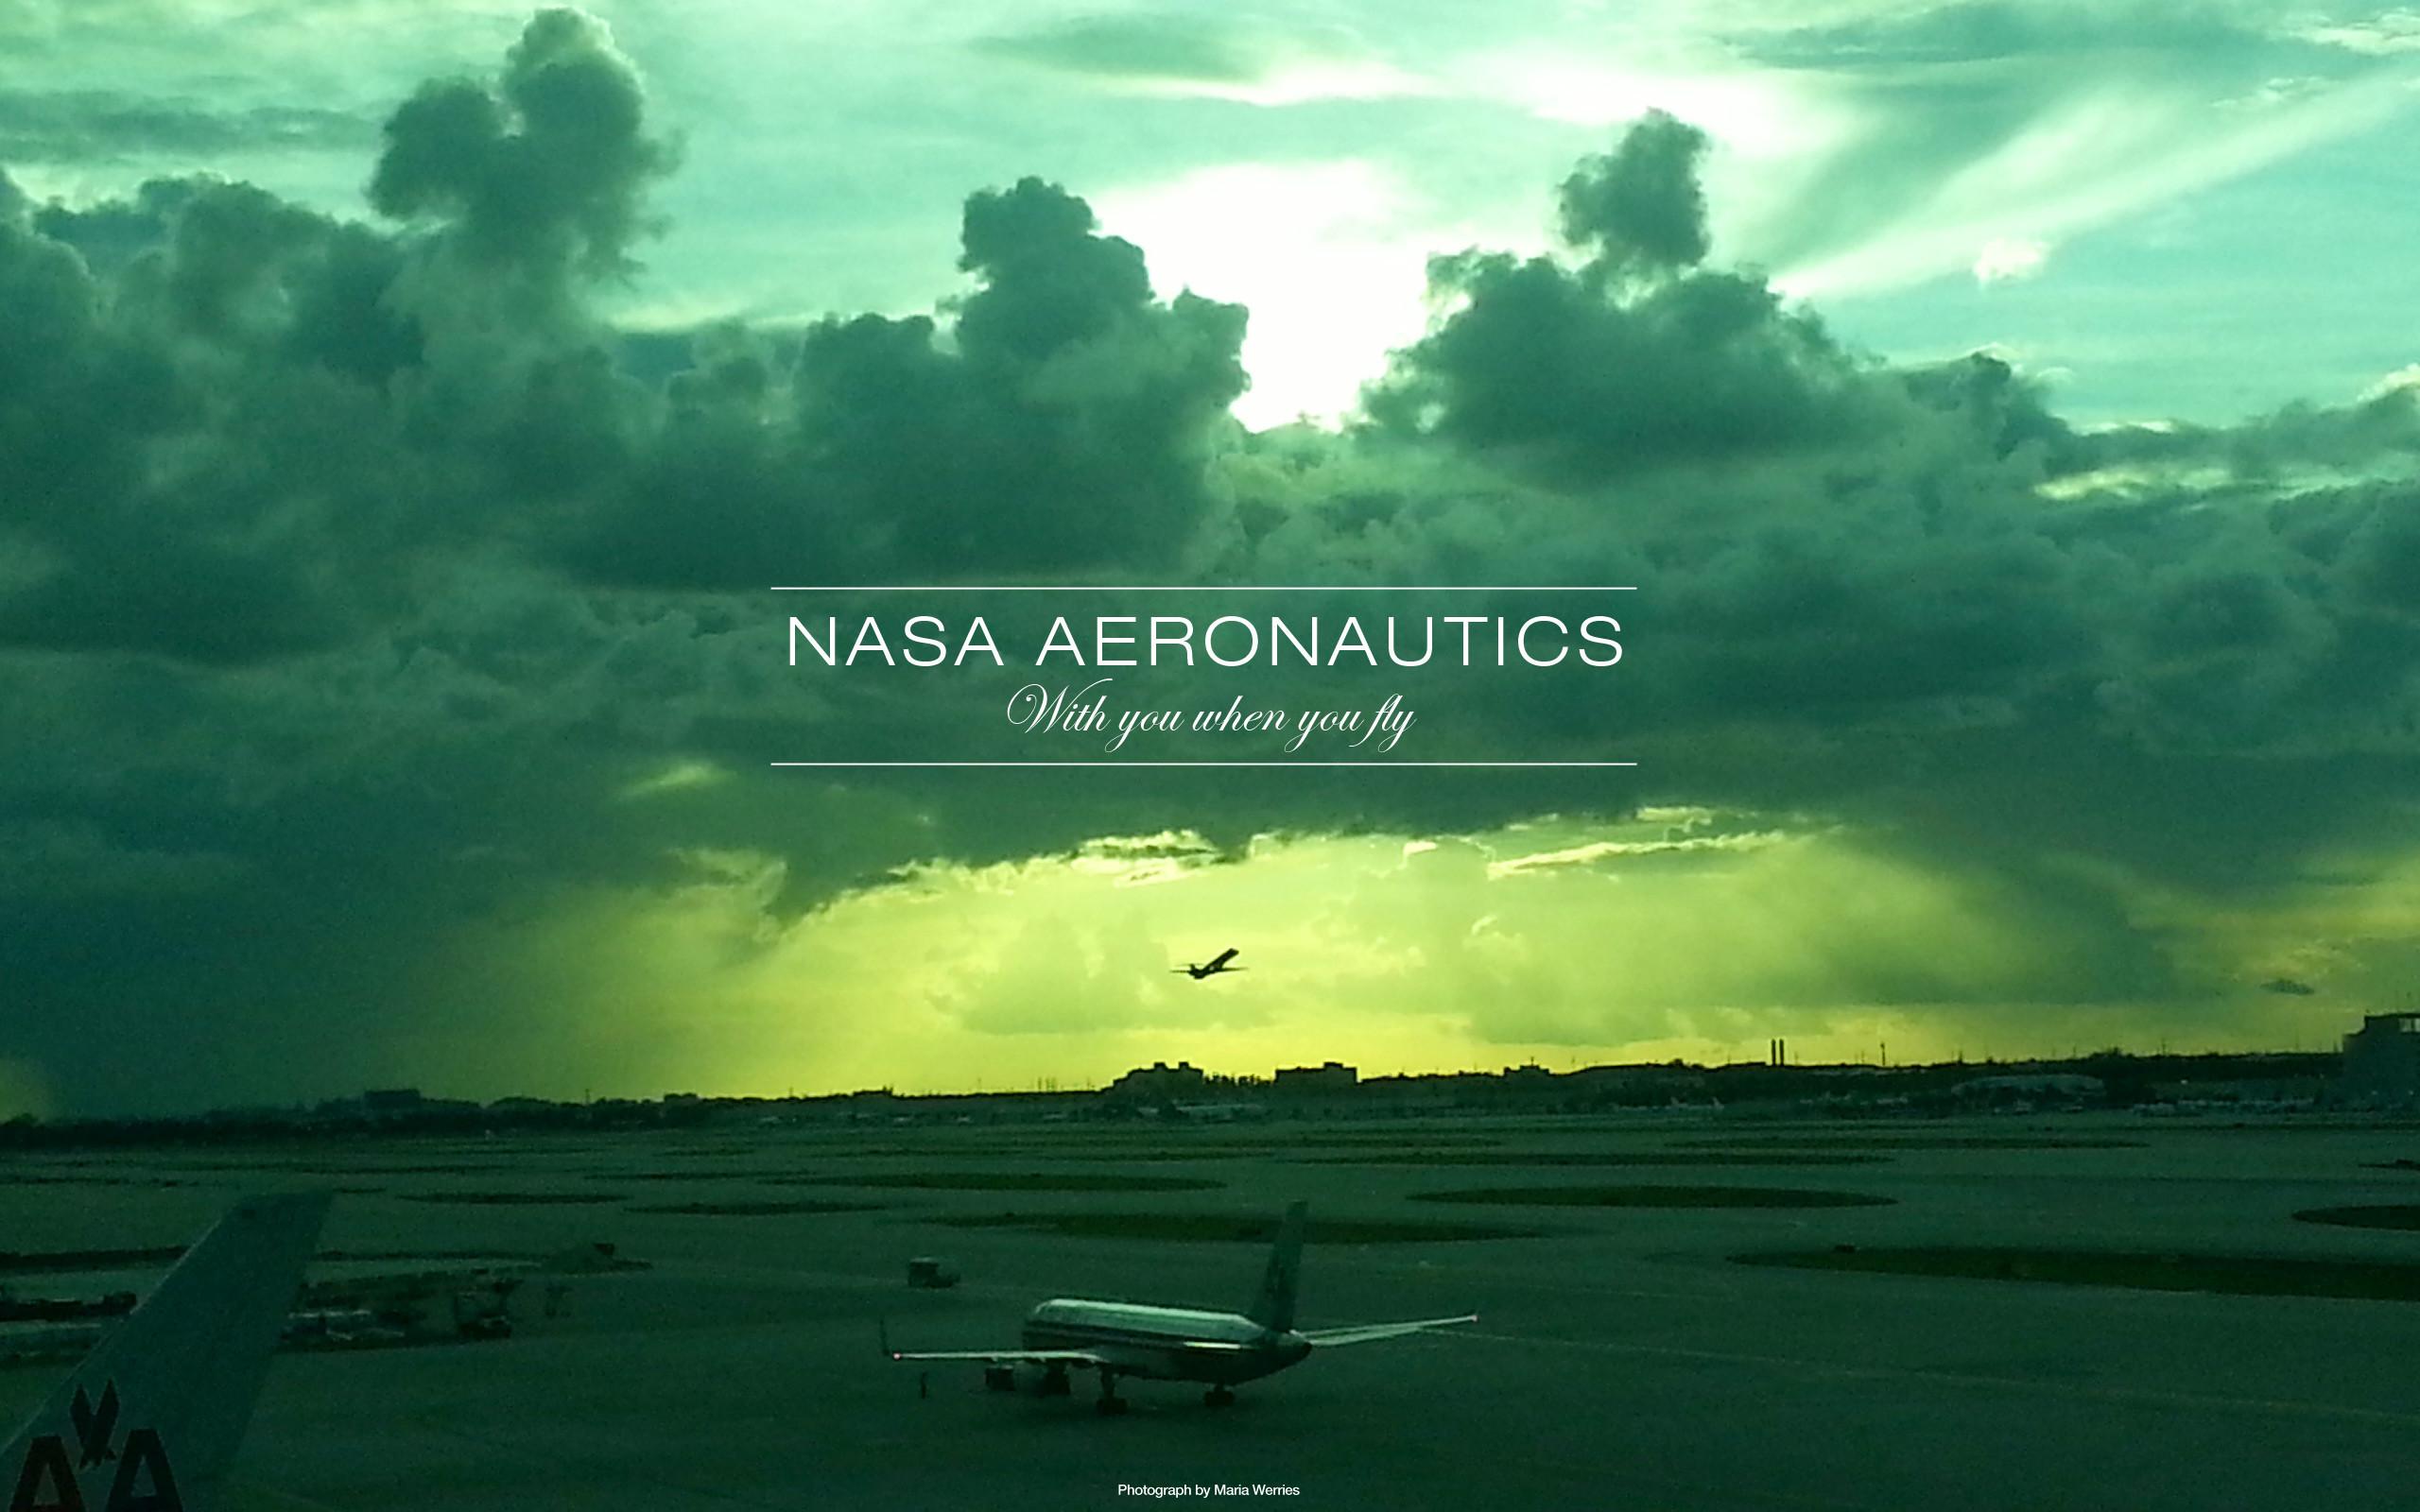 NASA Aeronautics Wallpaper Design 2